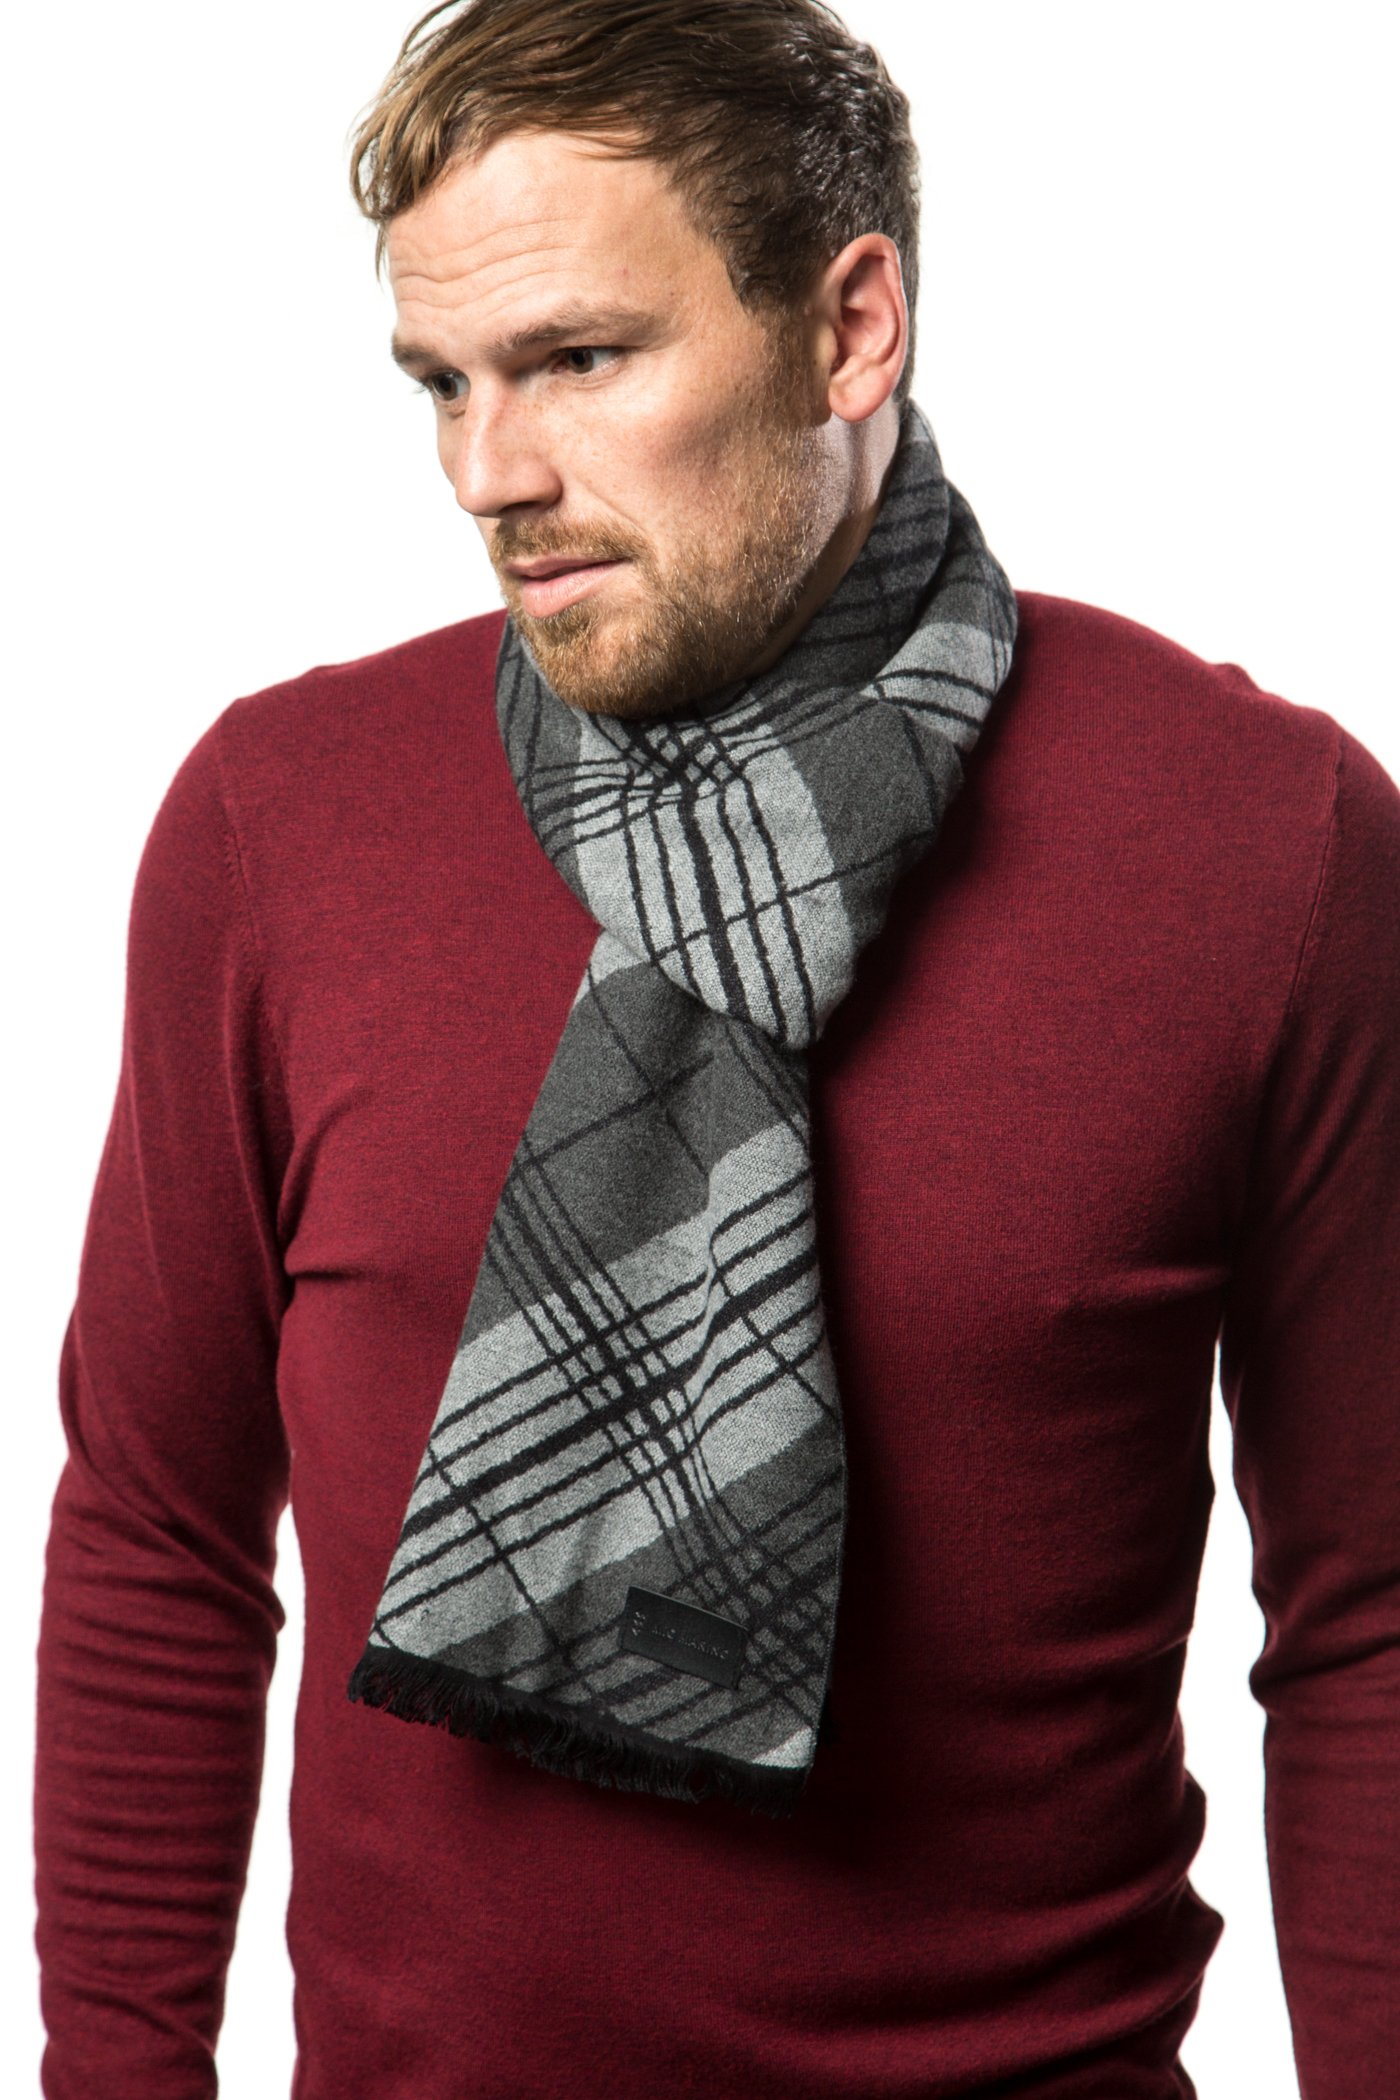 Marino's Winter Cashmere Feel Men Scarf,100% Cotton Fashion Scarves, In Elegant Gift Box - Black Gray Diagonal Plaid